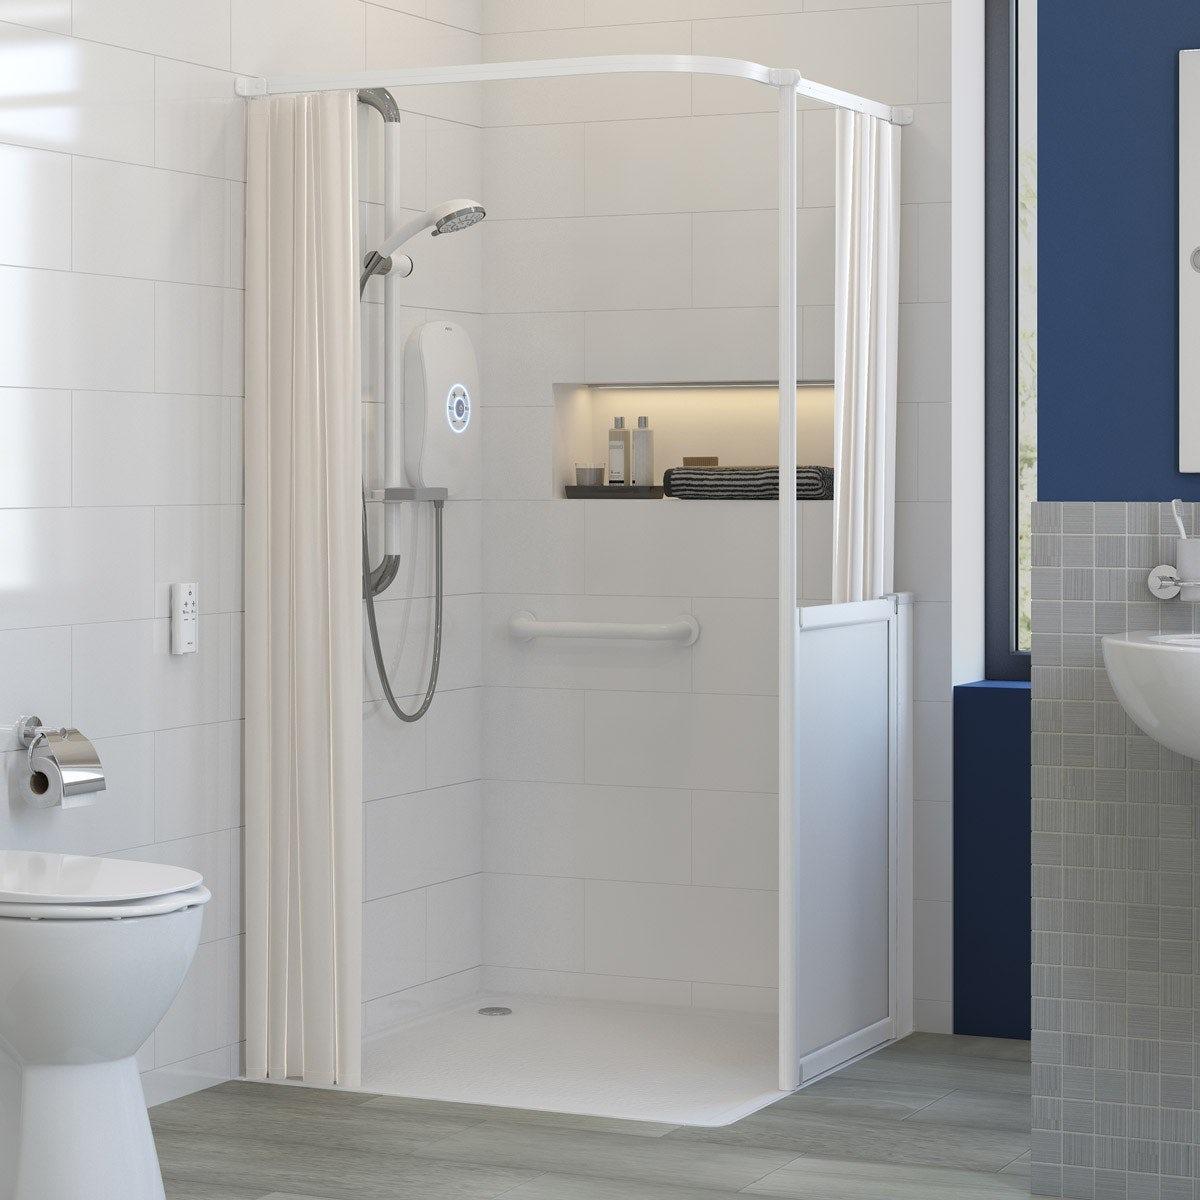 AKW L shaped shower curtain rail 1500 x 1200 | VictoriaPlum.com